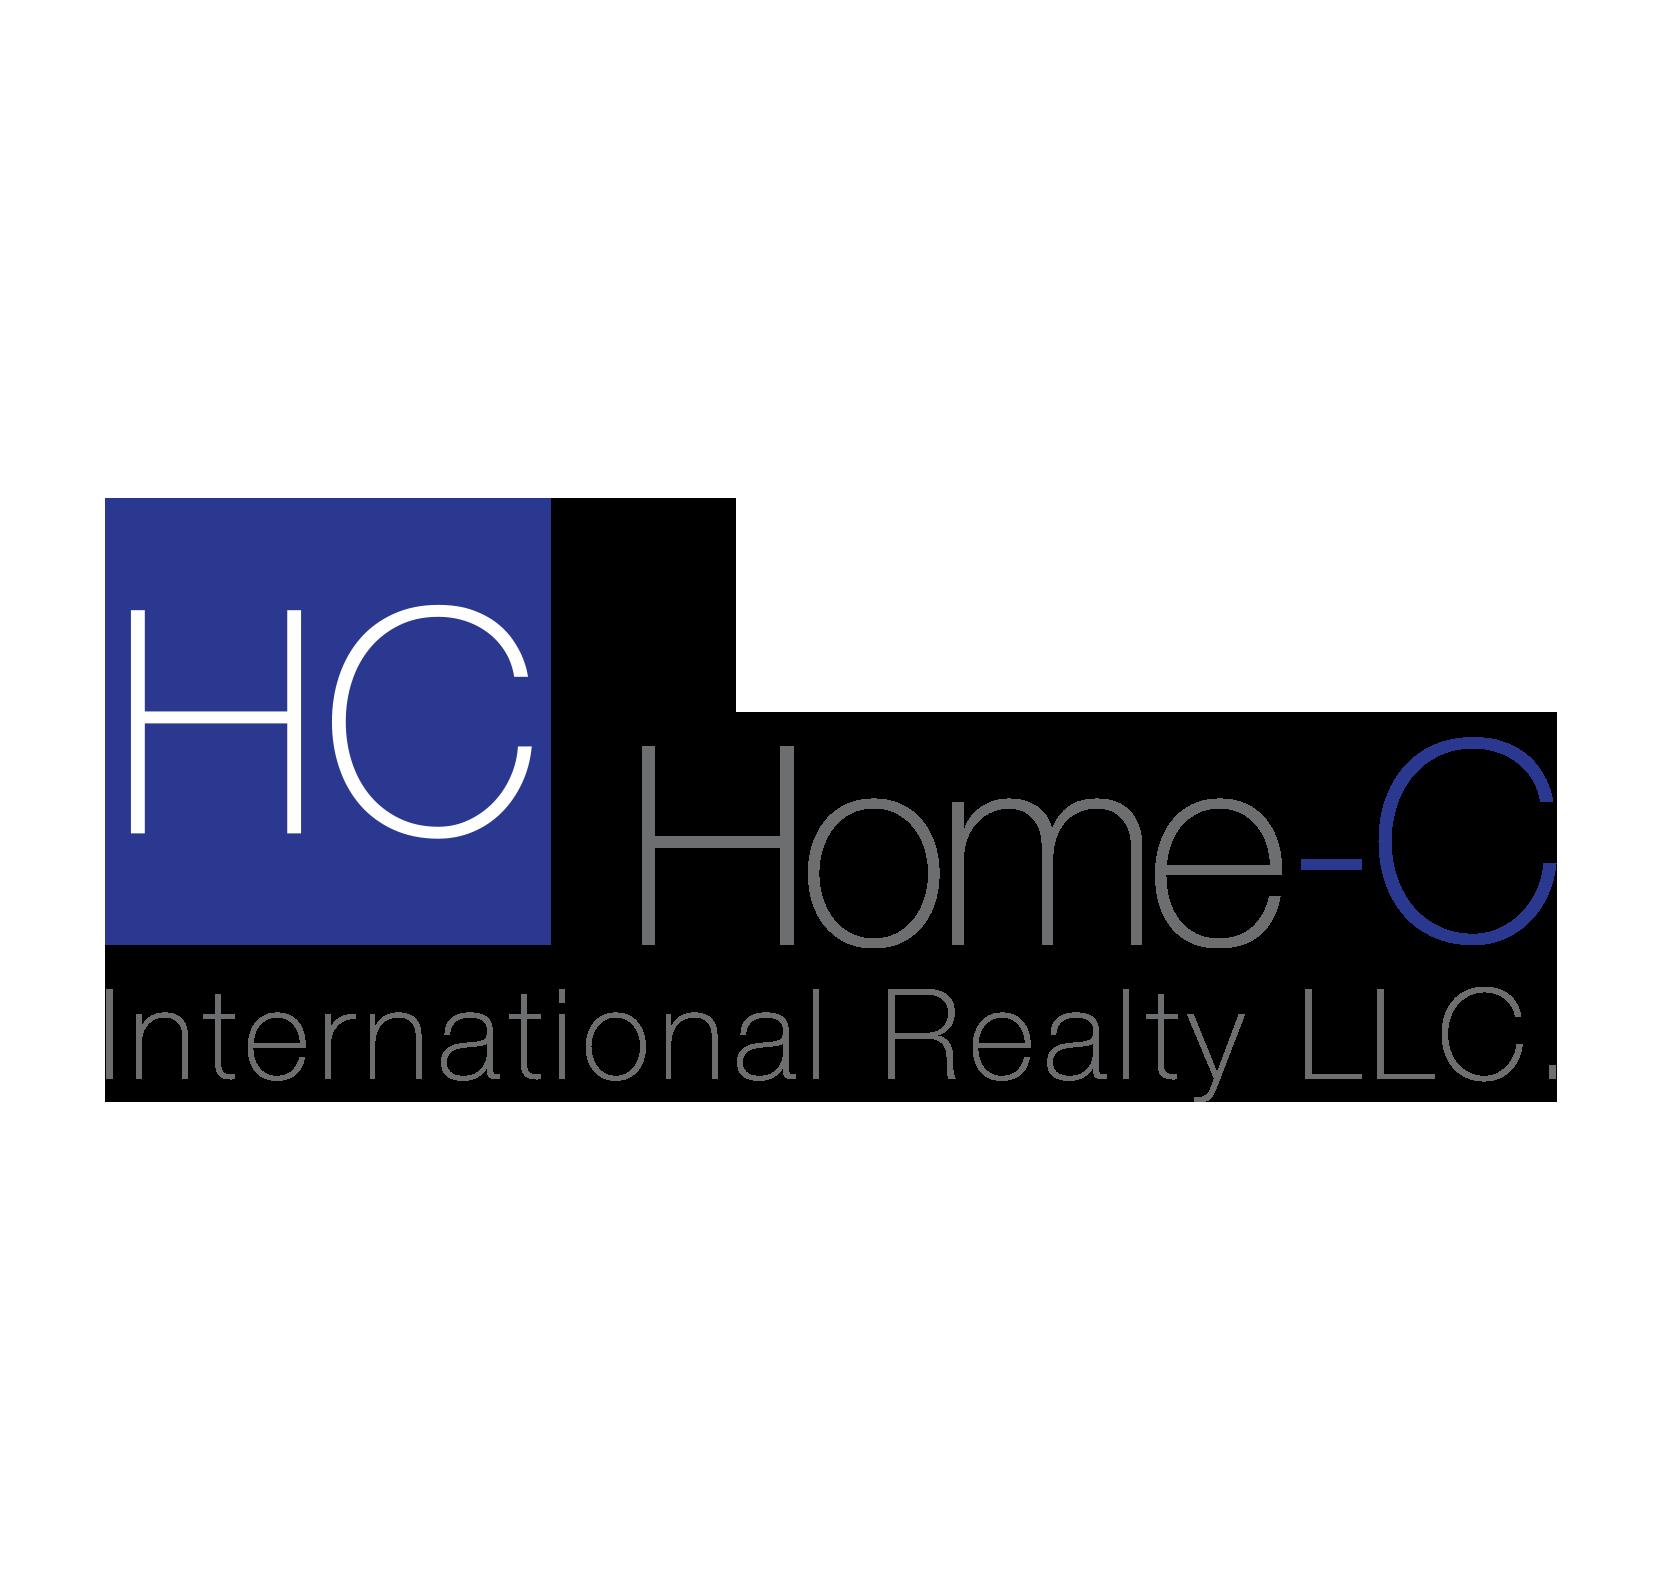 Home-C International Realty